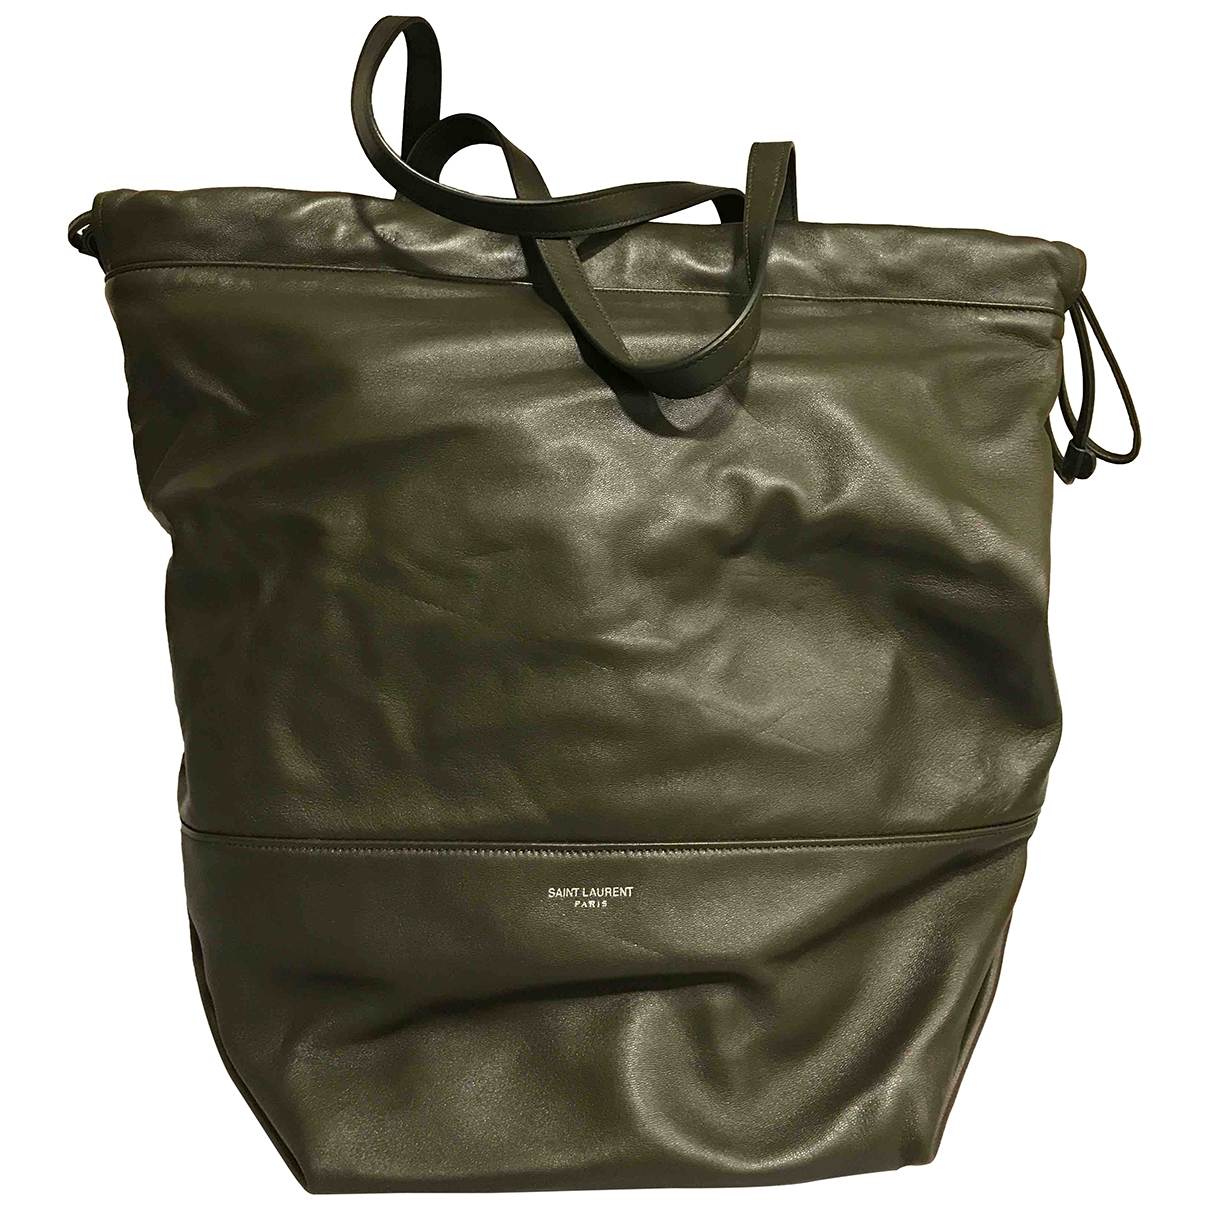 Saint Laurent \N Handtasche in  Khaki Leder